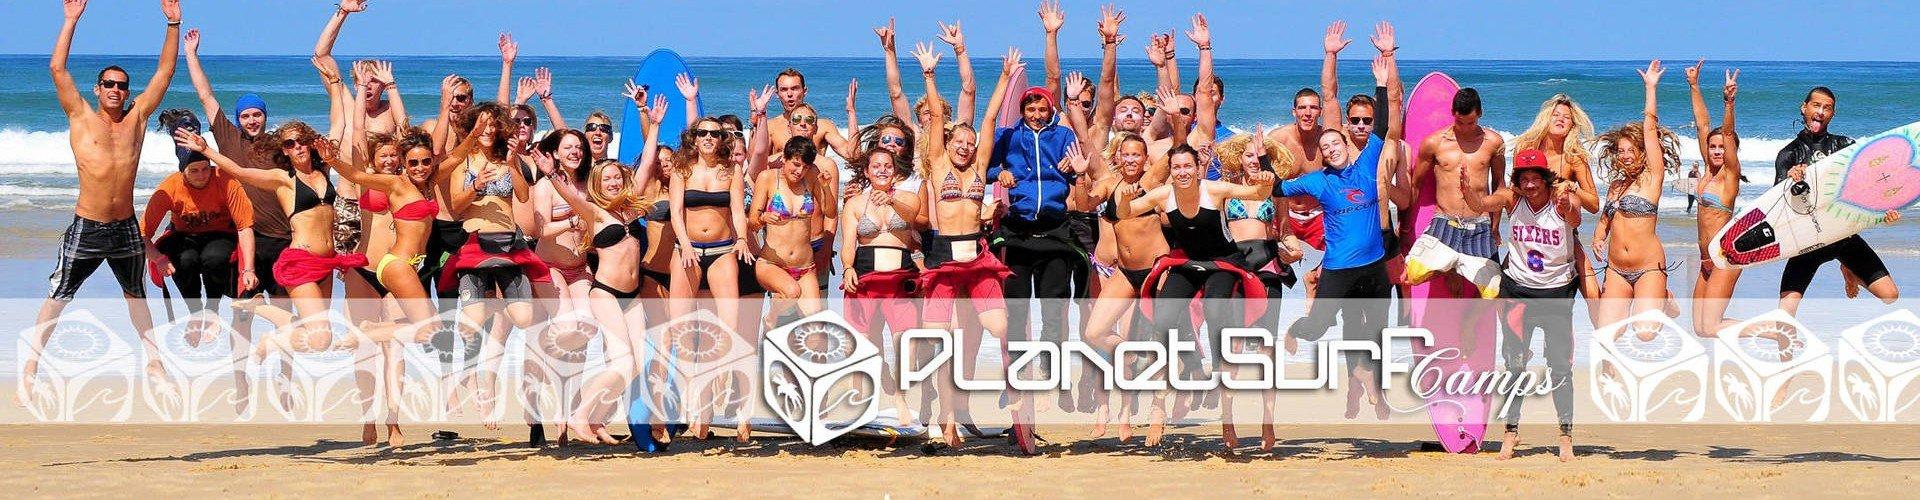 Erstaunlich Planet Surf Camps Kurs